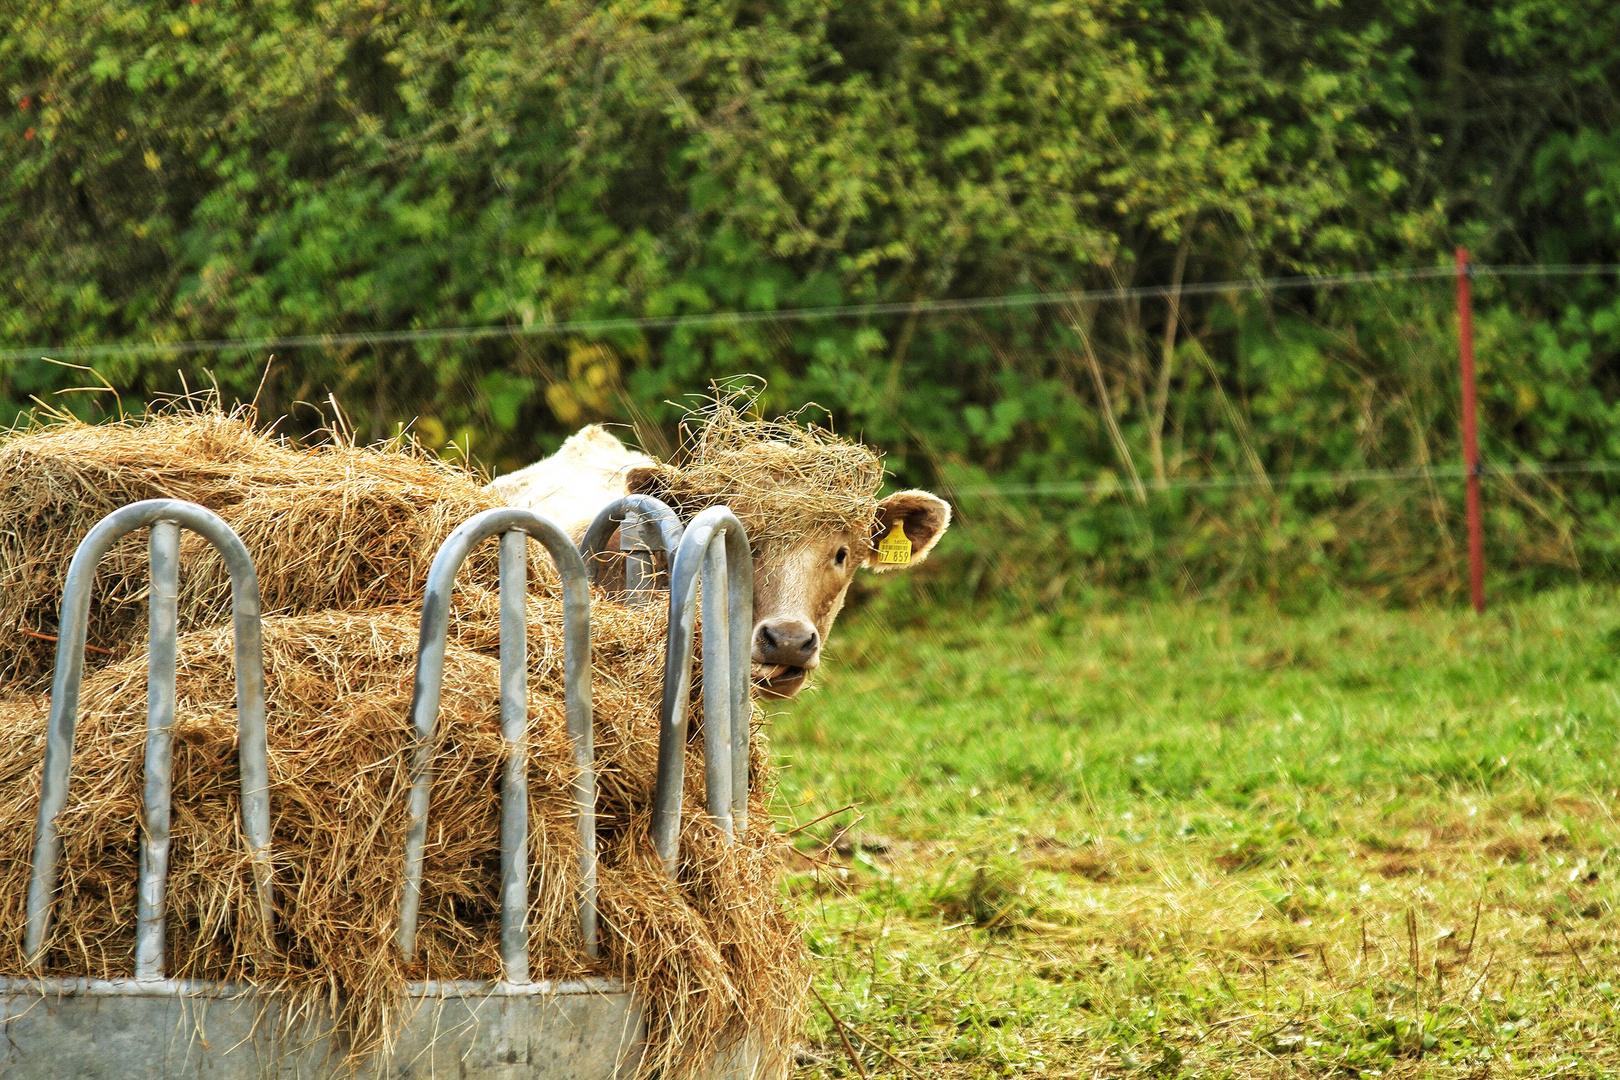 Kuh mit Hut